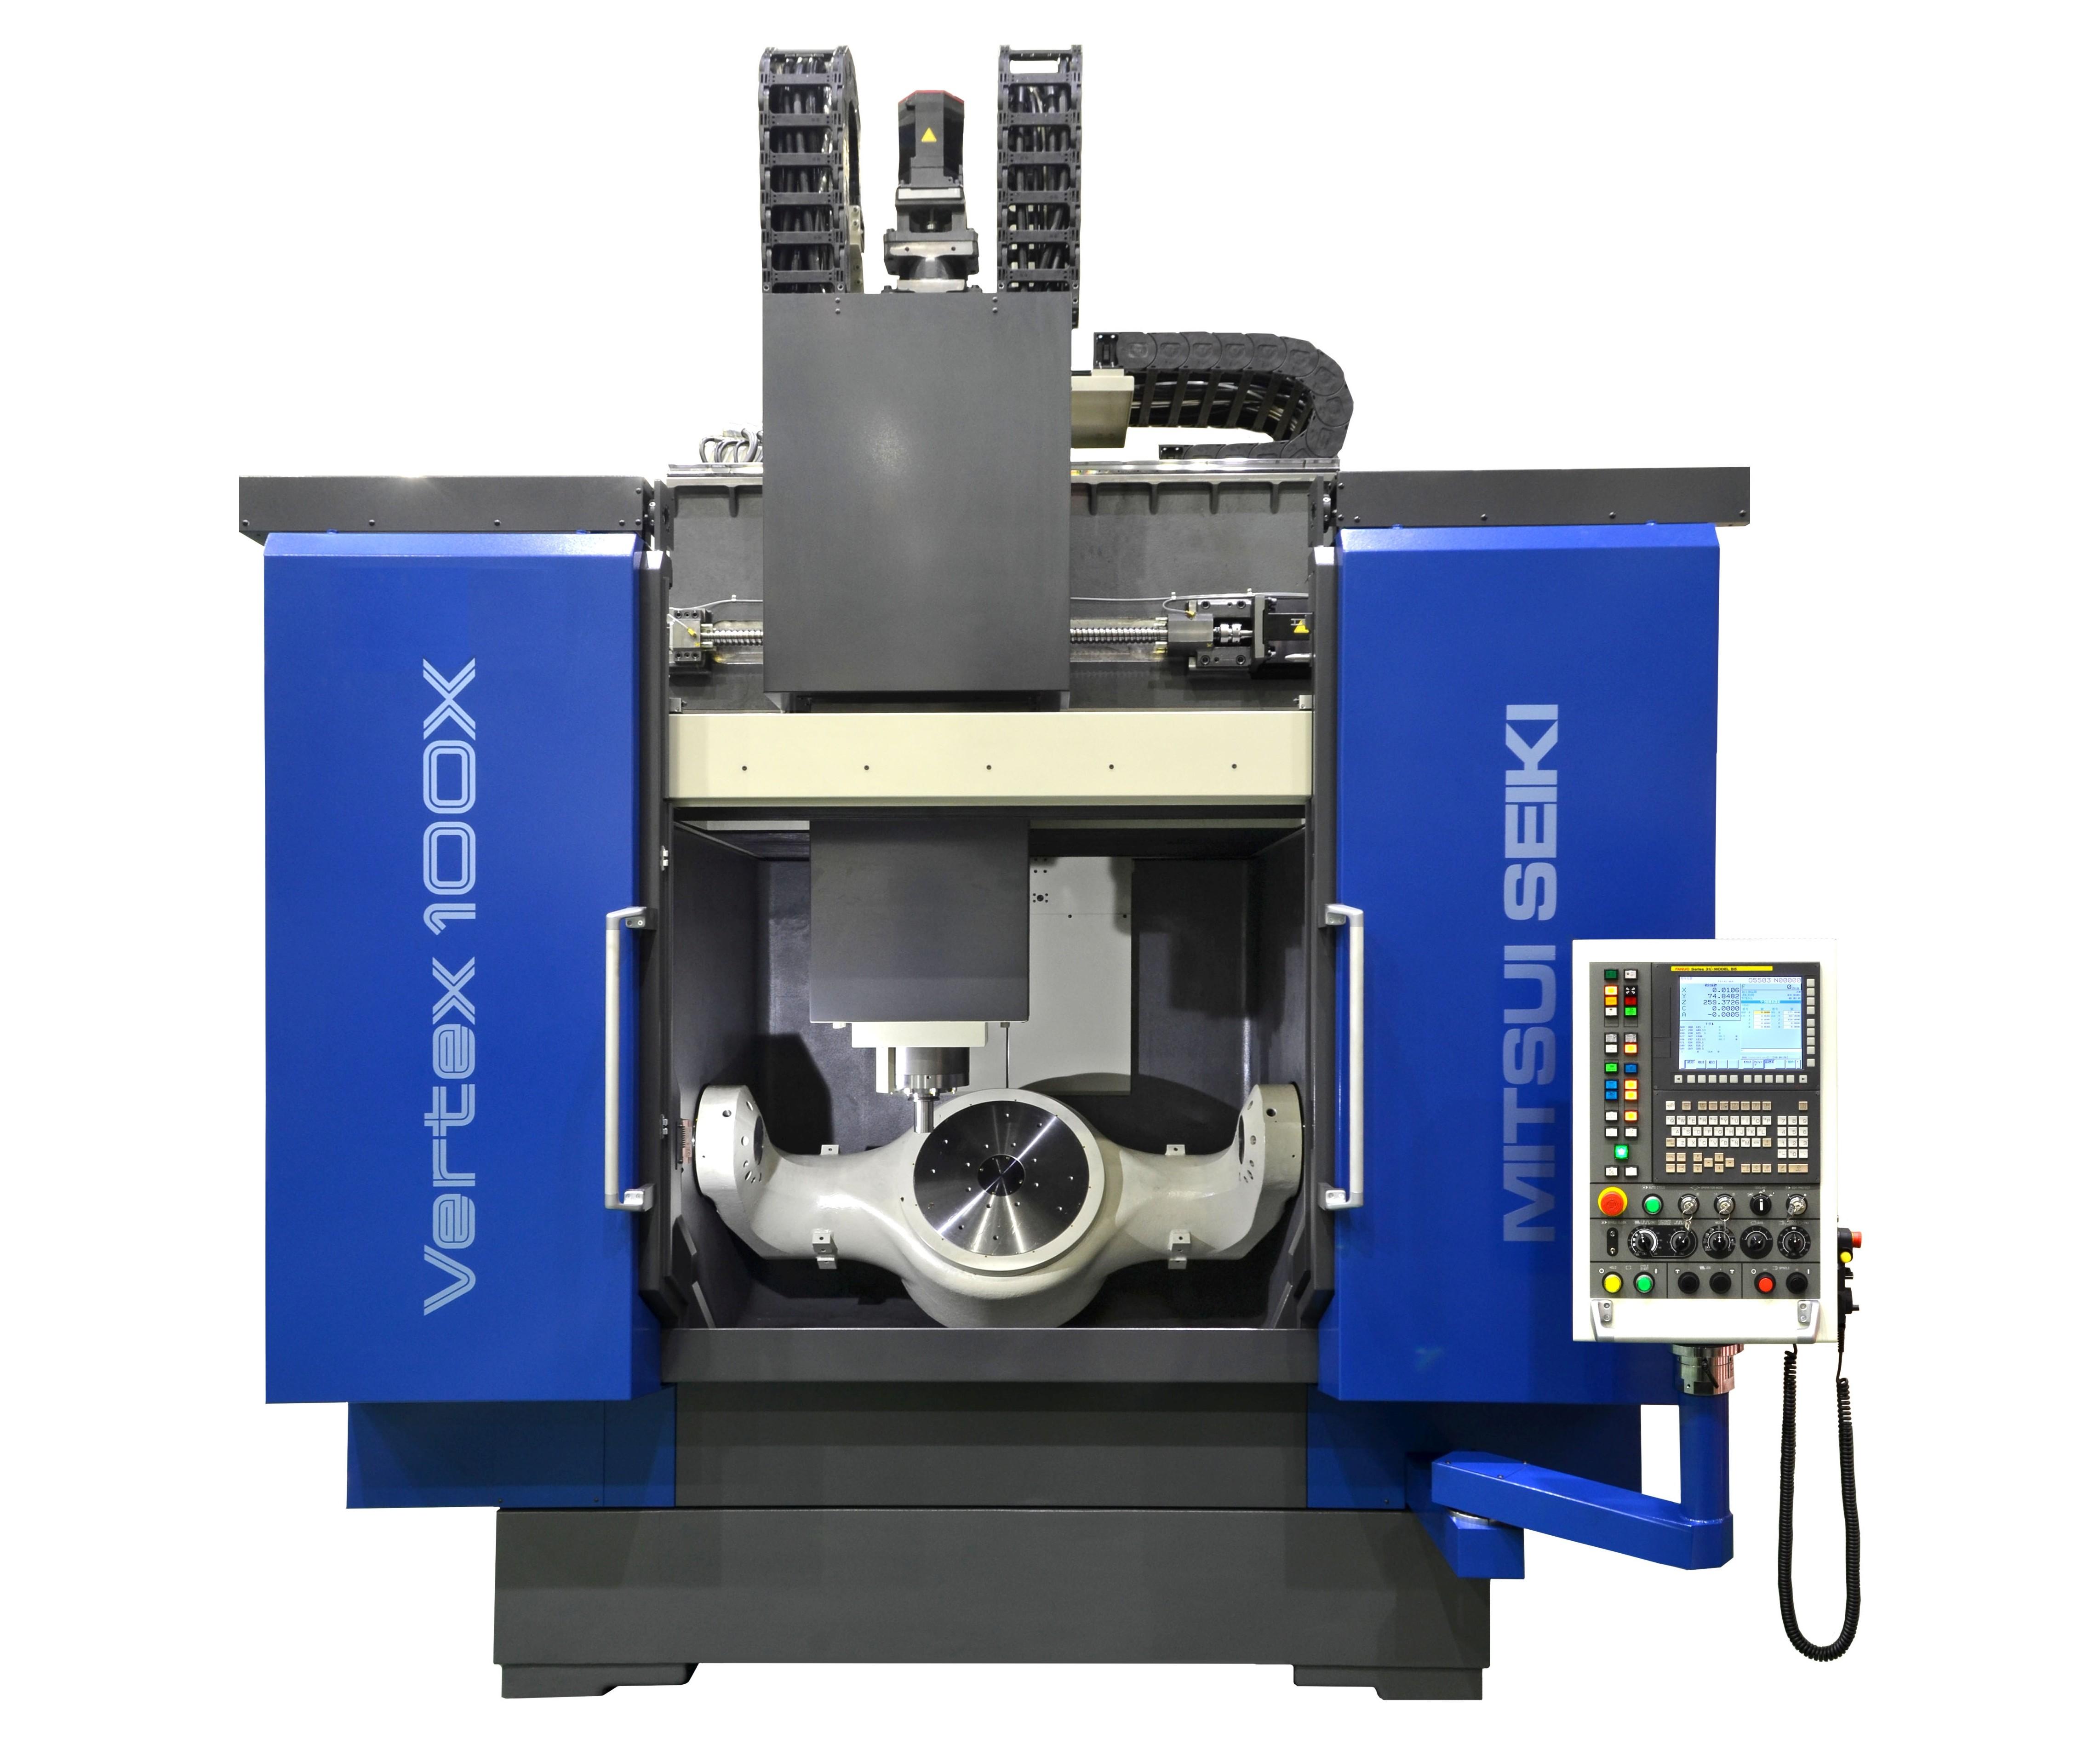 Mitsui Seiki's Vertex 100 5-axis VMC